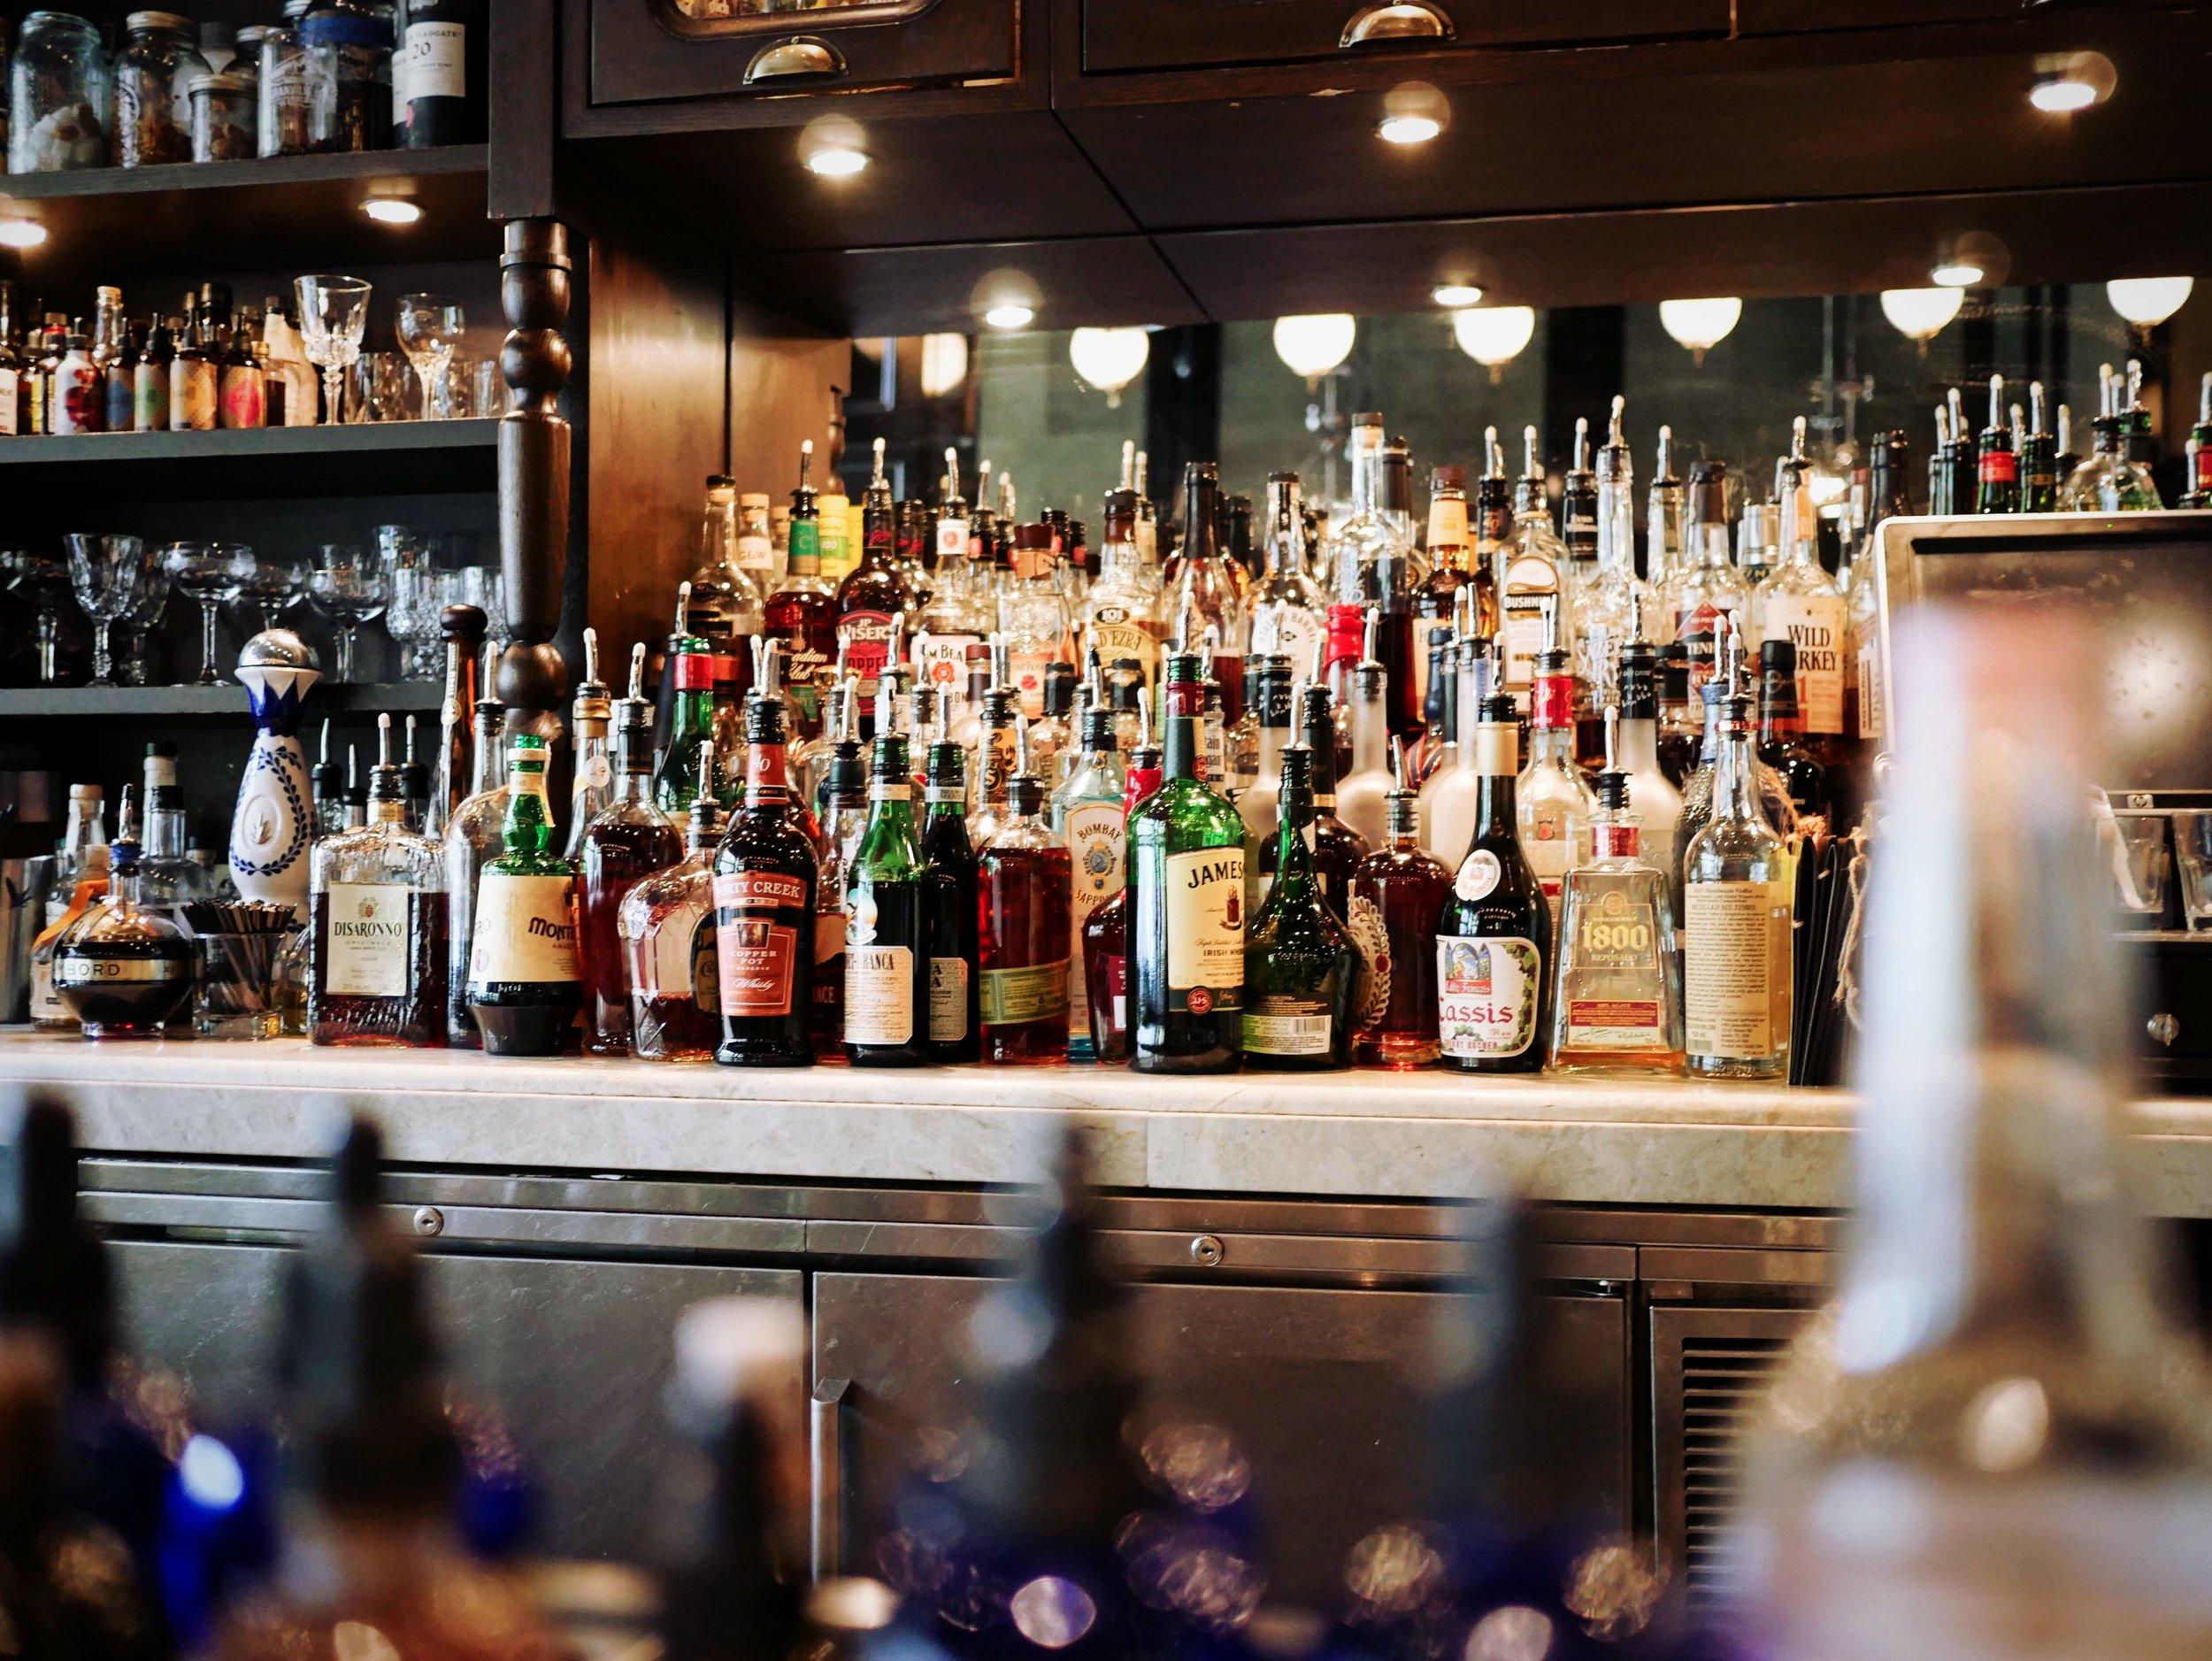 Healthy alcohol drinks dunnebells.jpg